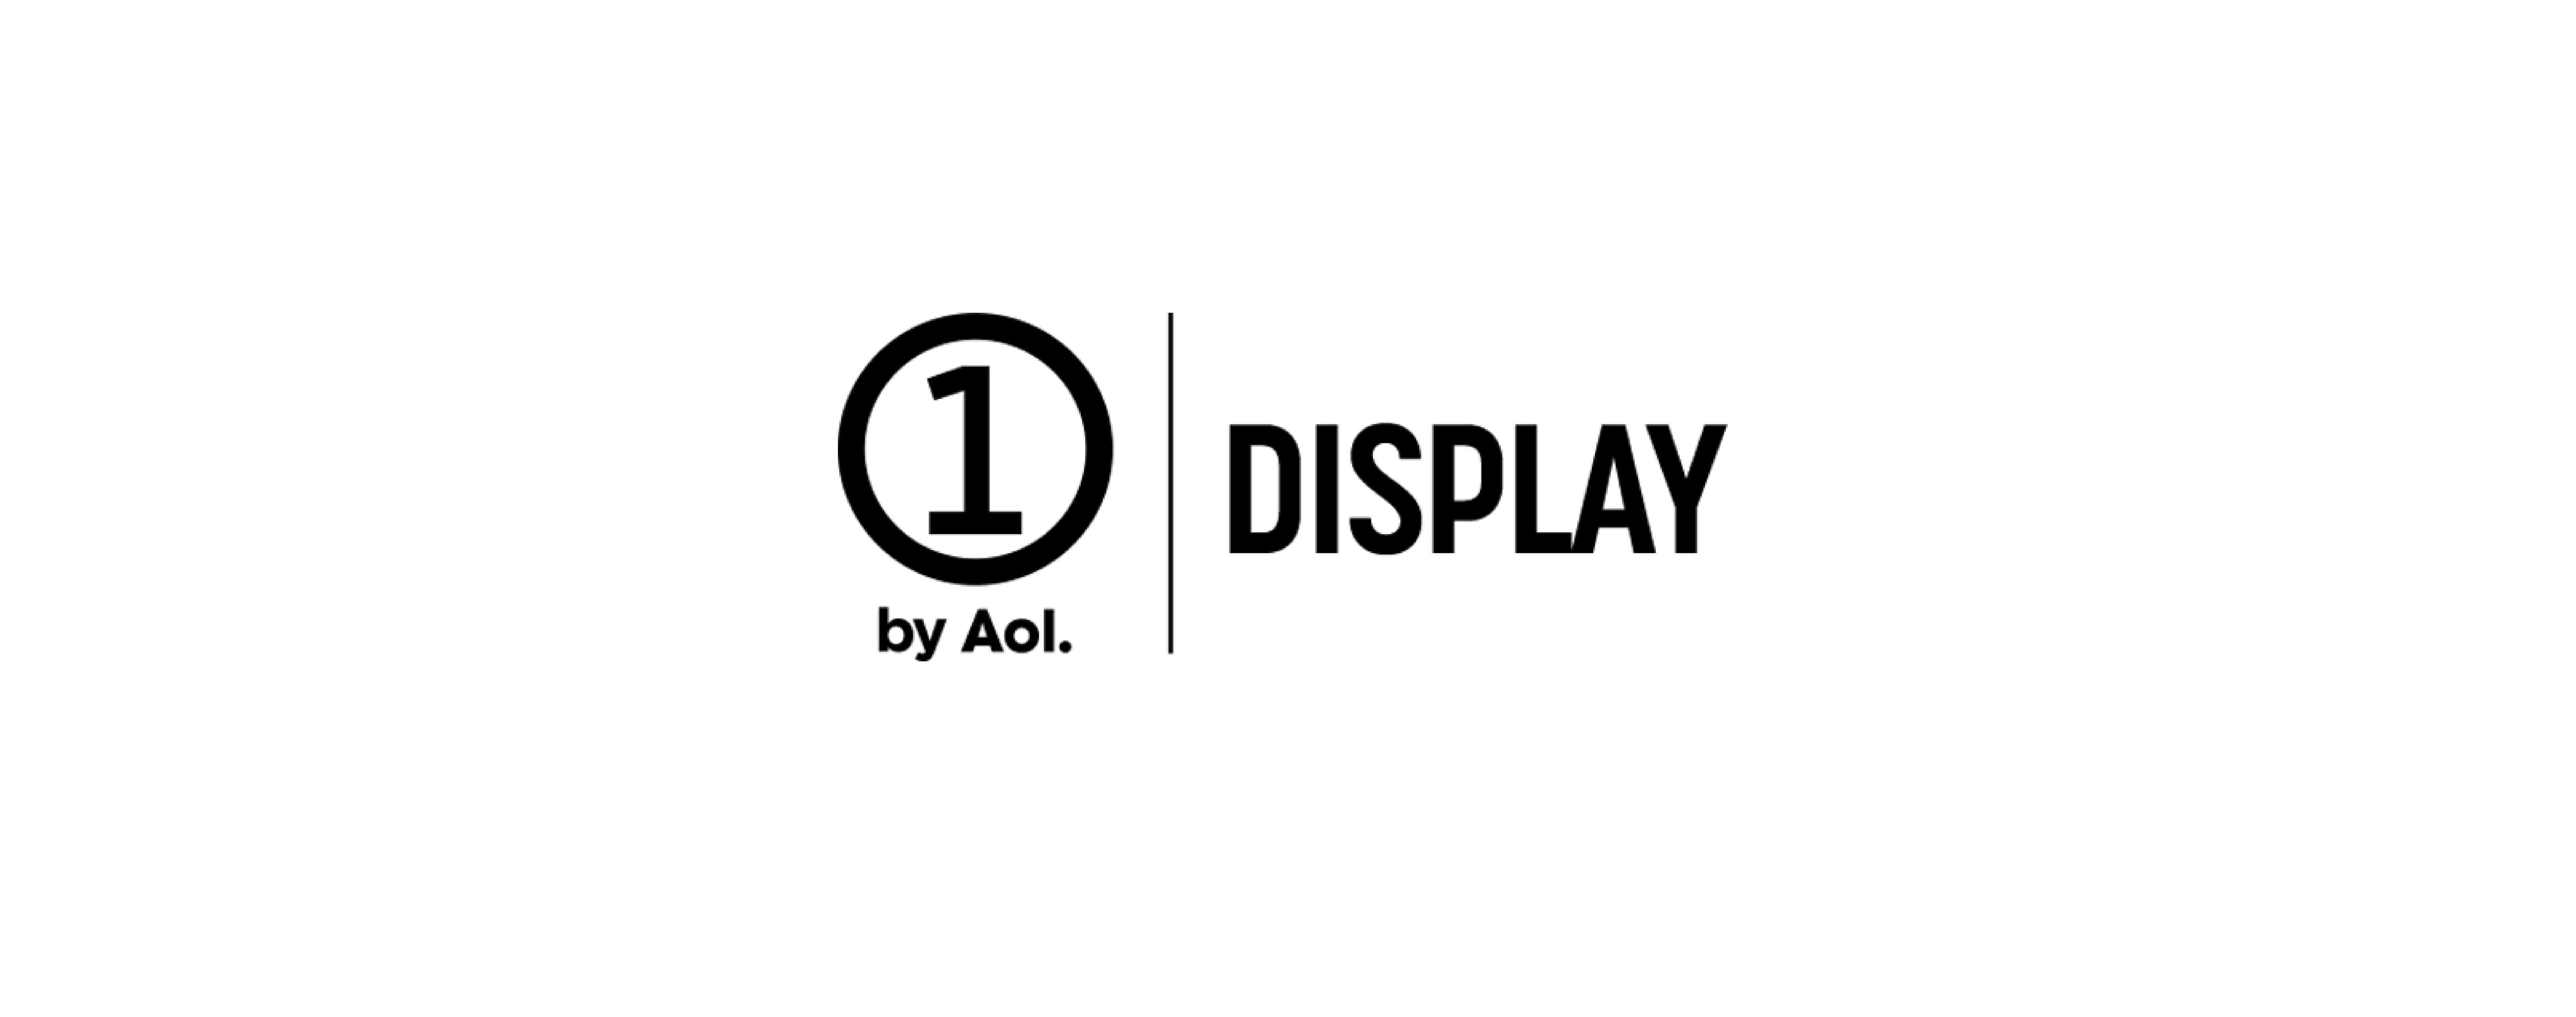 Aol One Display